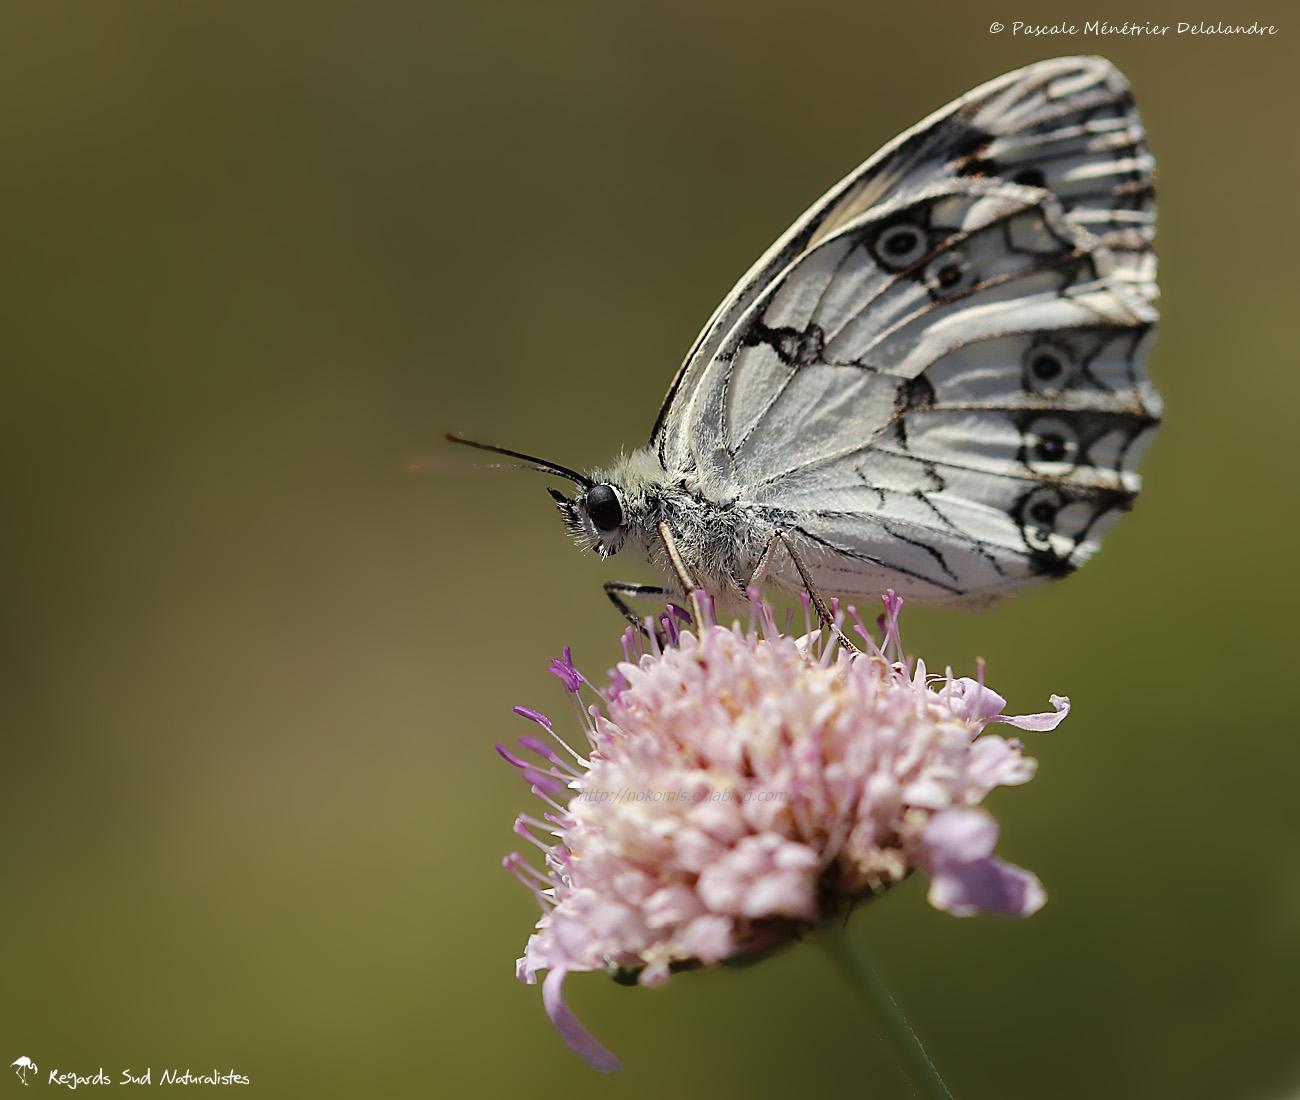 Demi deuil ♀ - Melanargia galathea - Nymphalidae